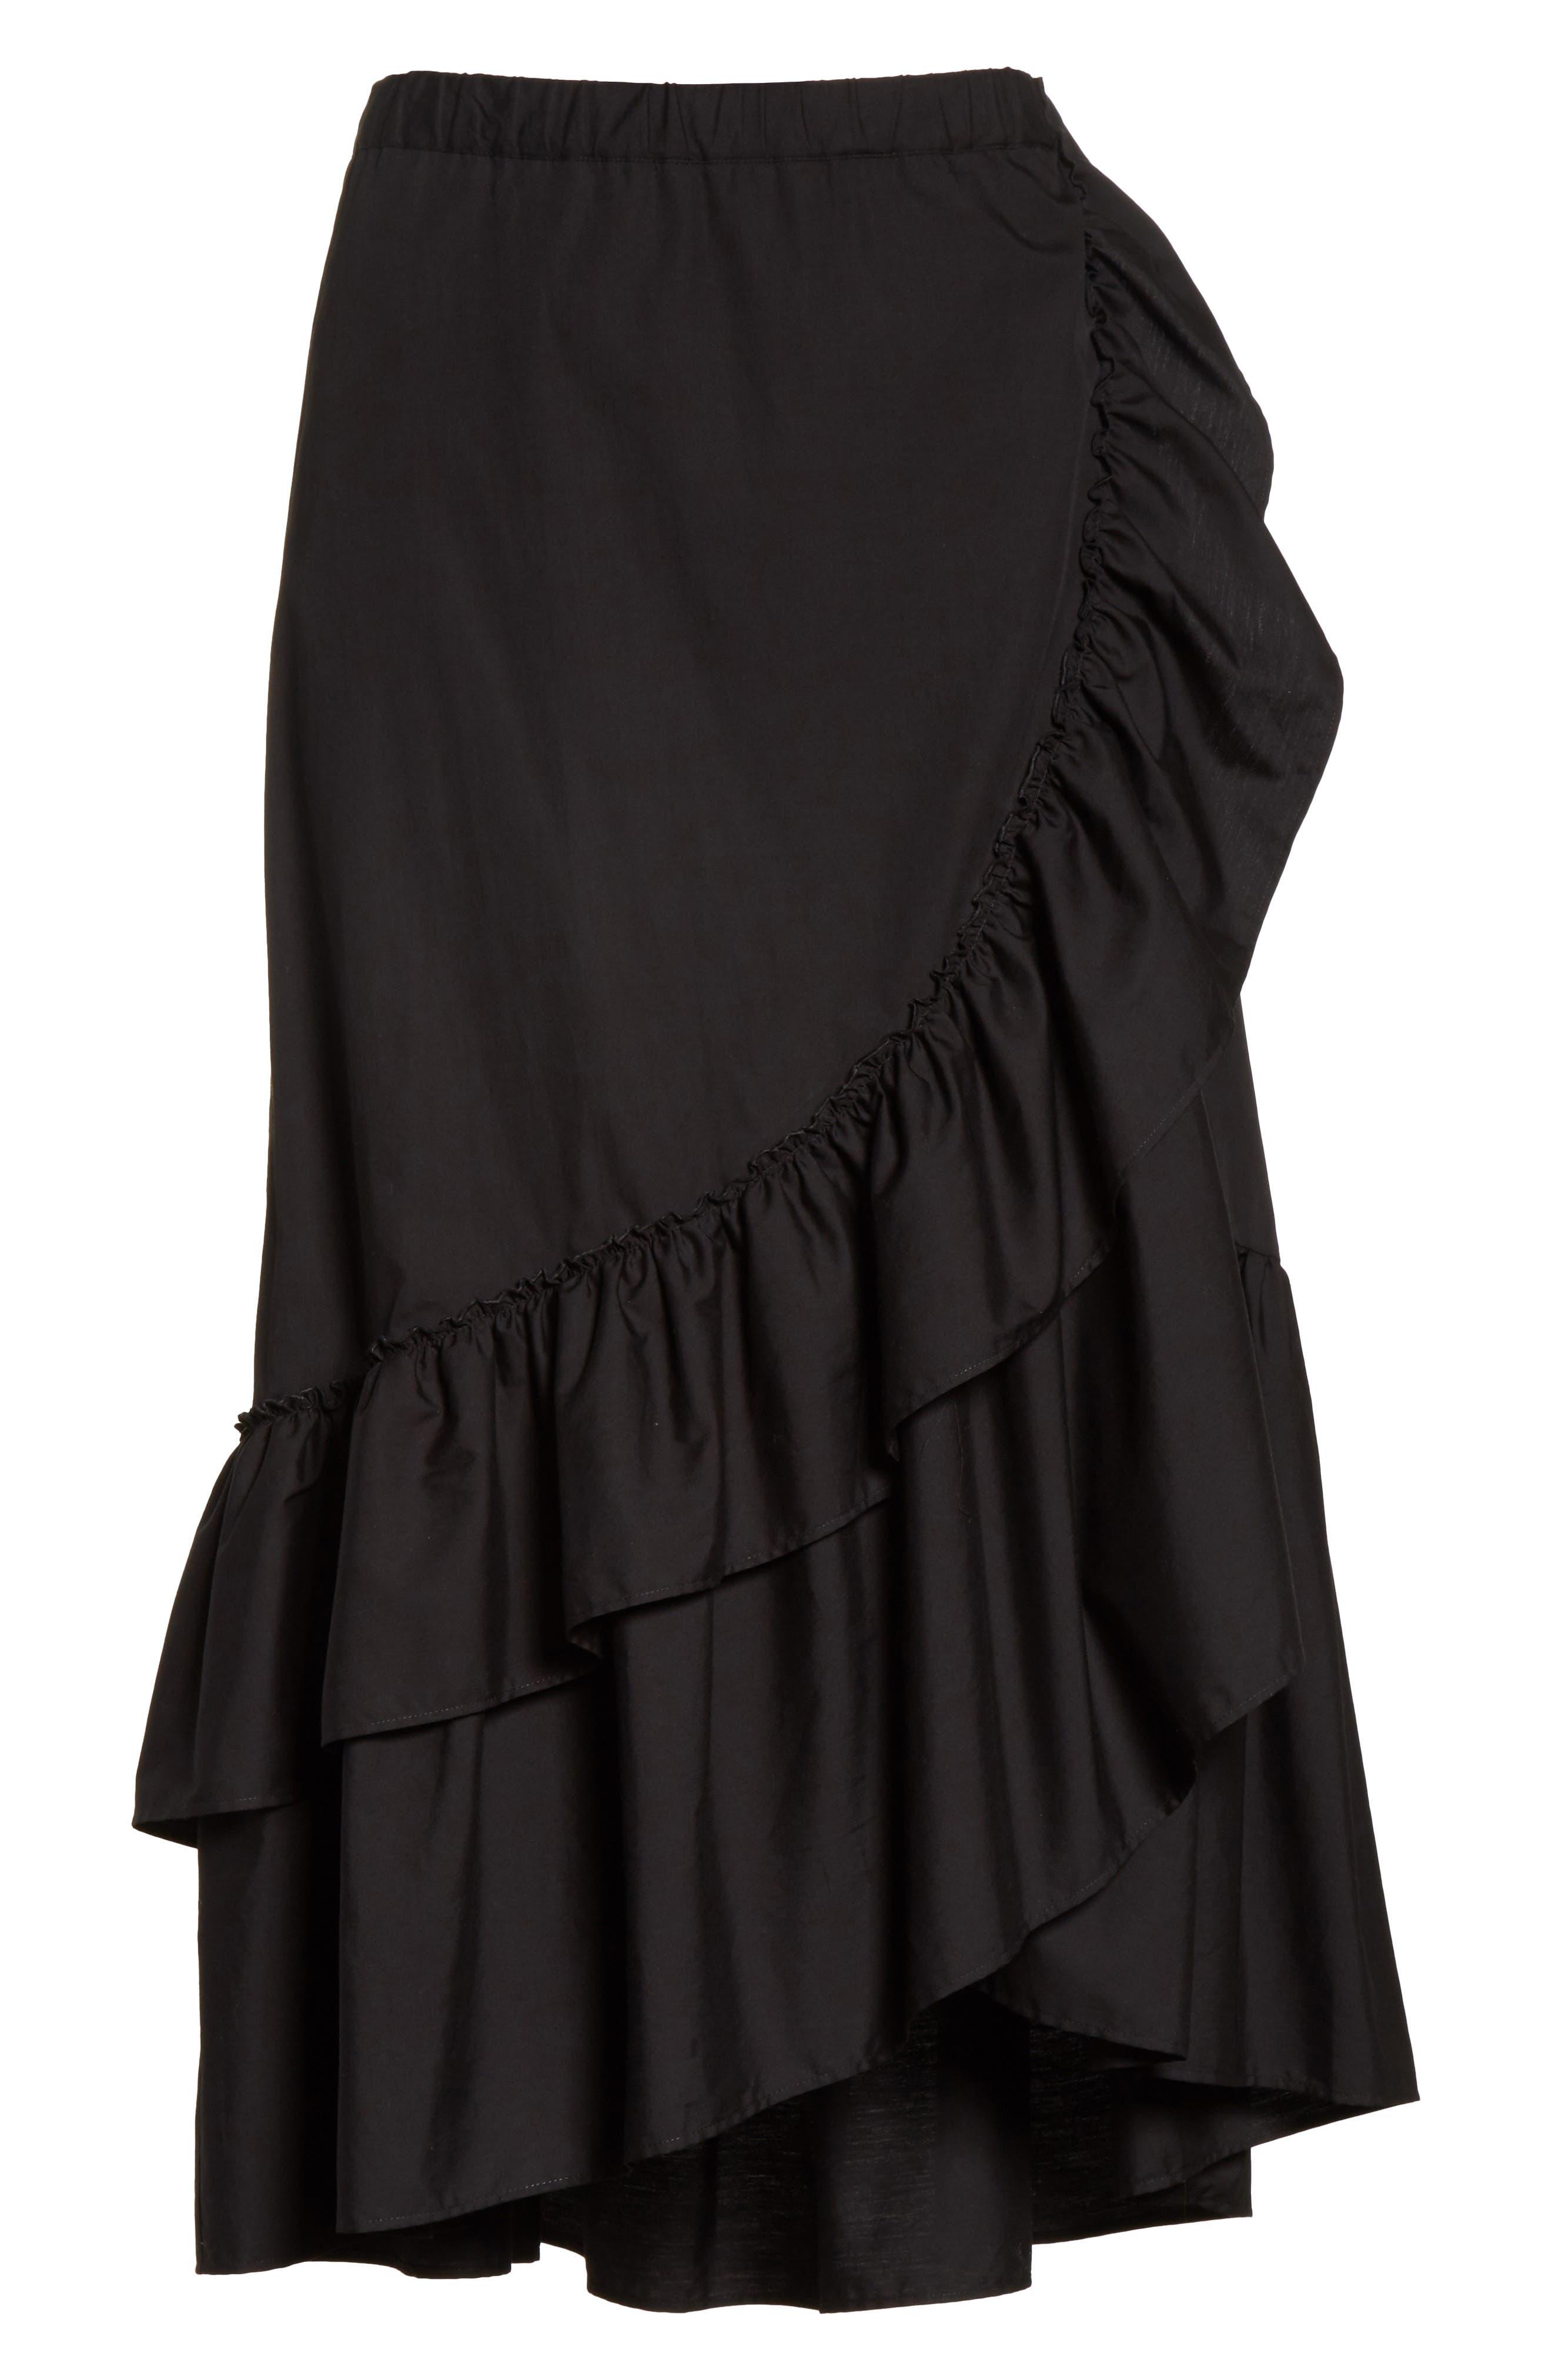 FUZZI,                             Ruffled Poplin Skirt,                             Alternate thumbnail 6, color,                             001